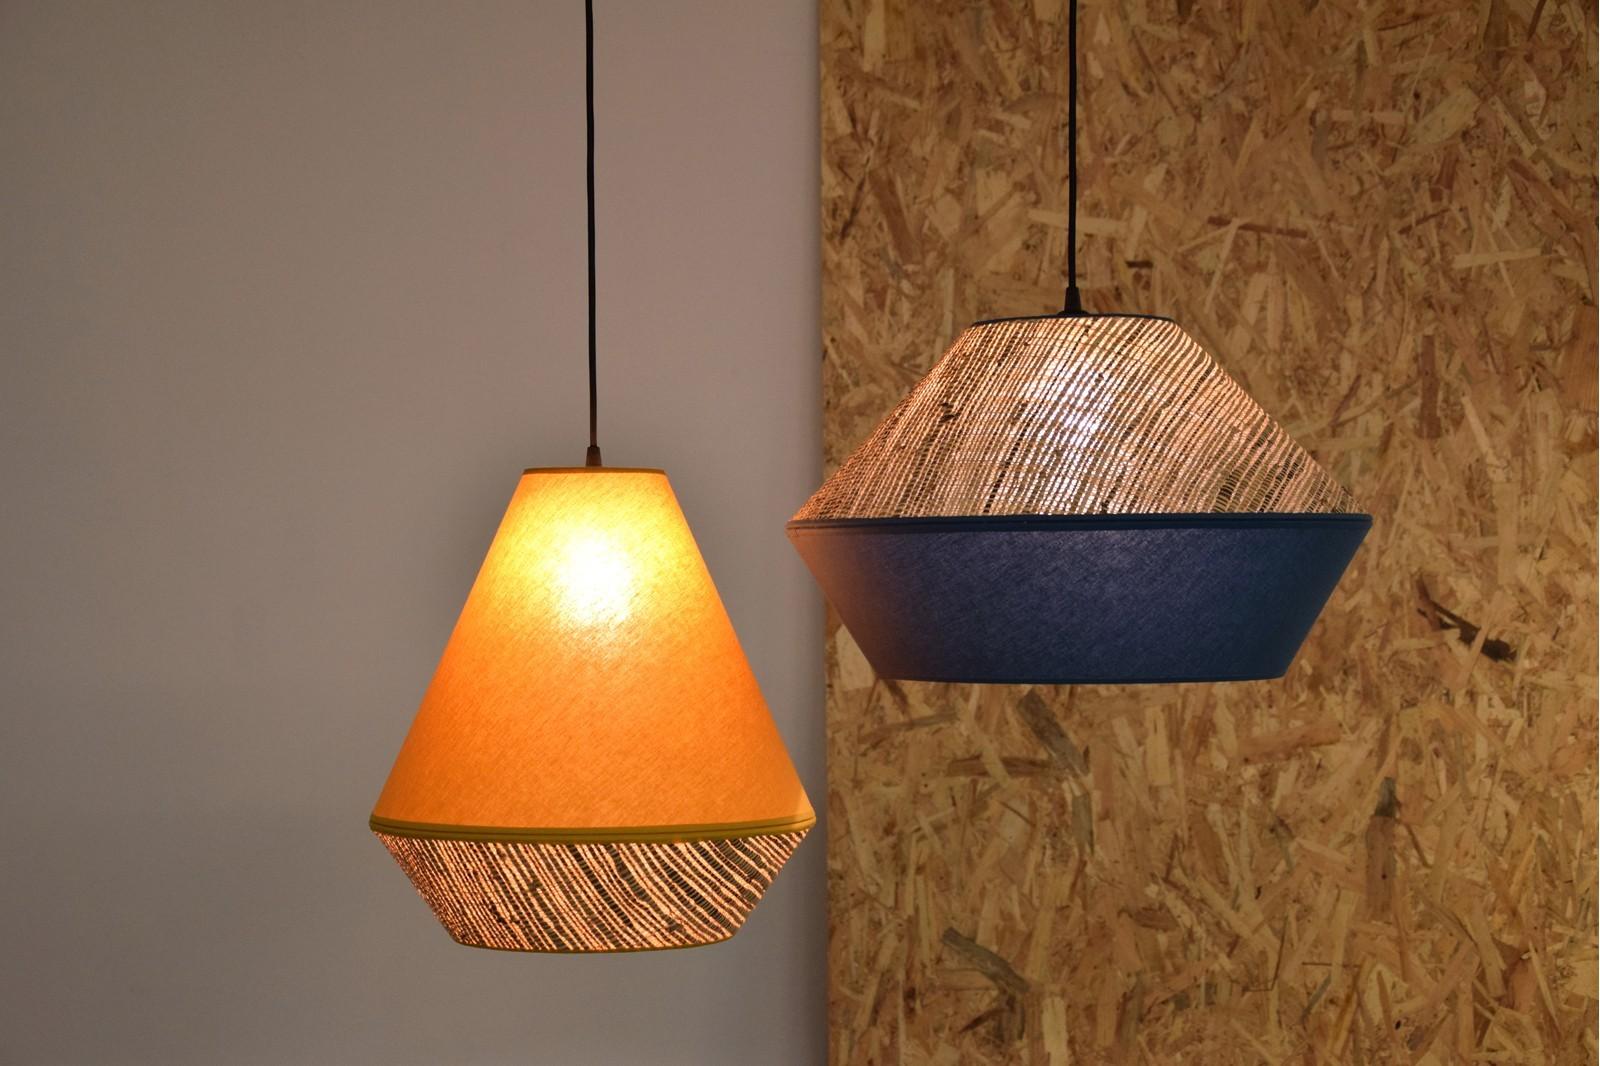 CEILING LAMP. RAFFIA-MUSTARD YELLOW